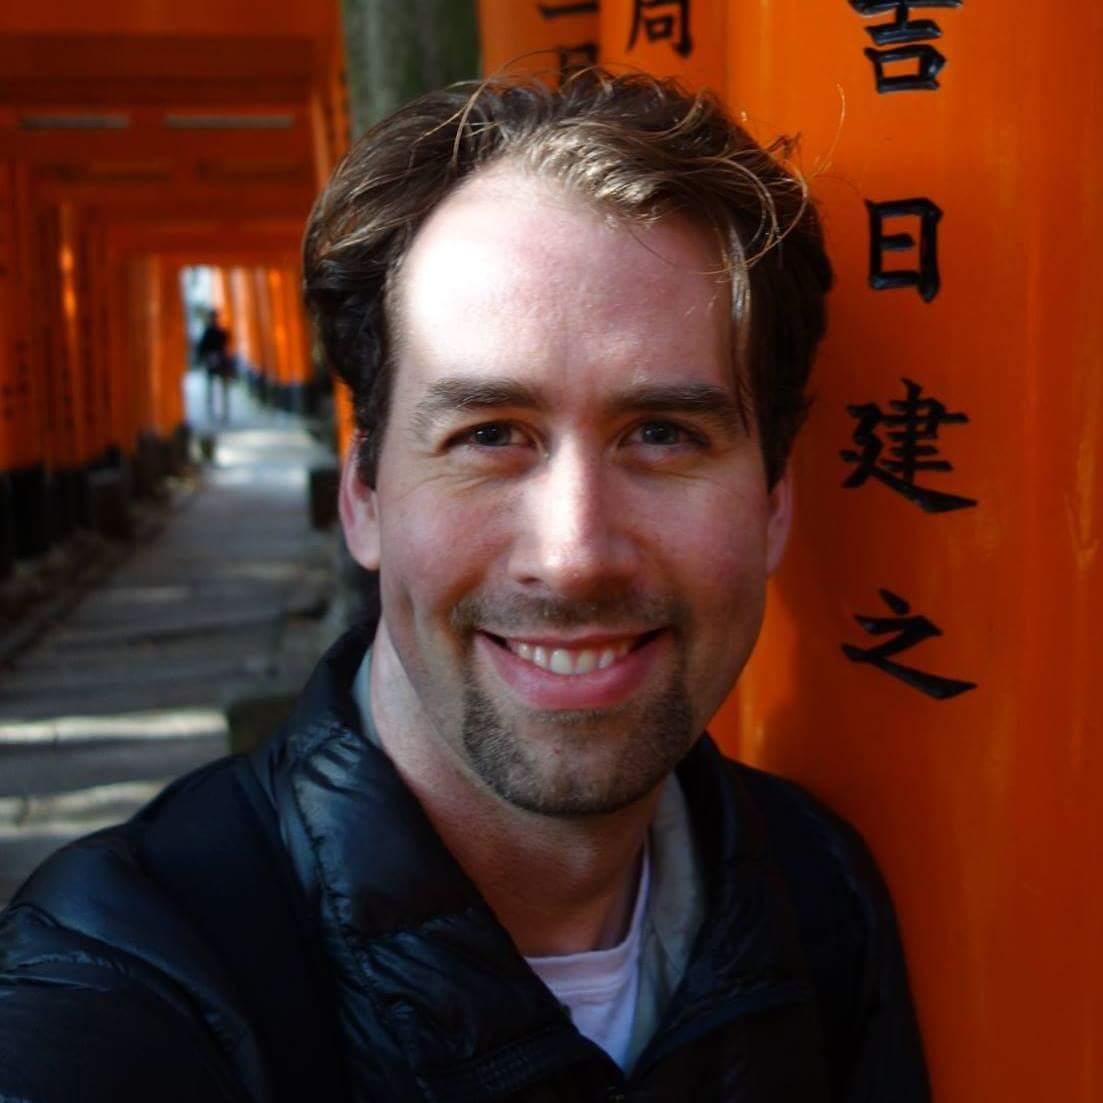 Jesse McQuarters in Kyoto, Japan